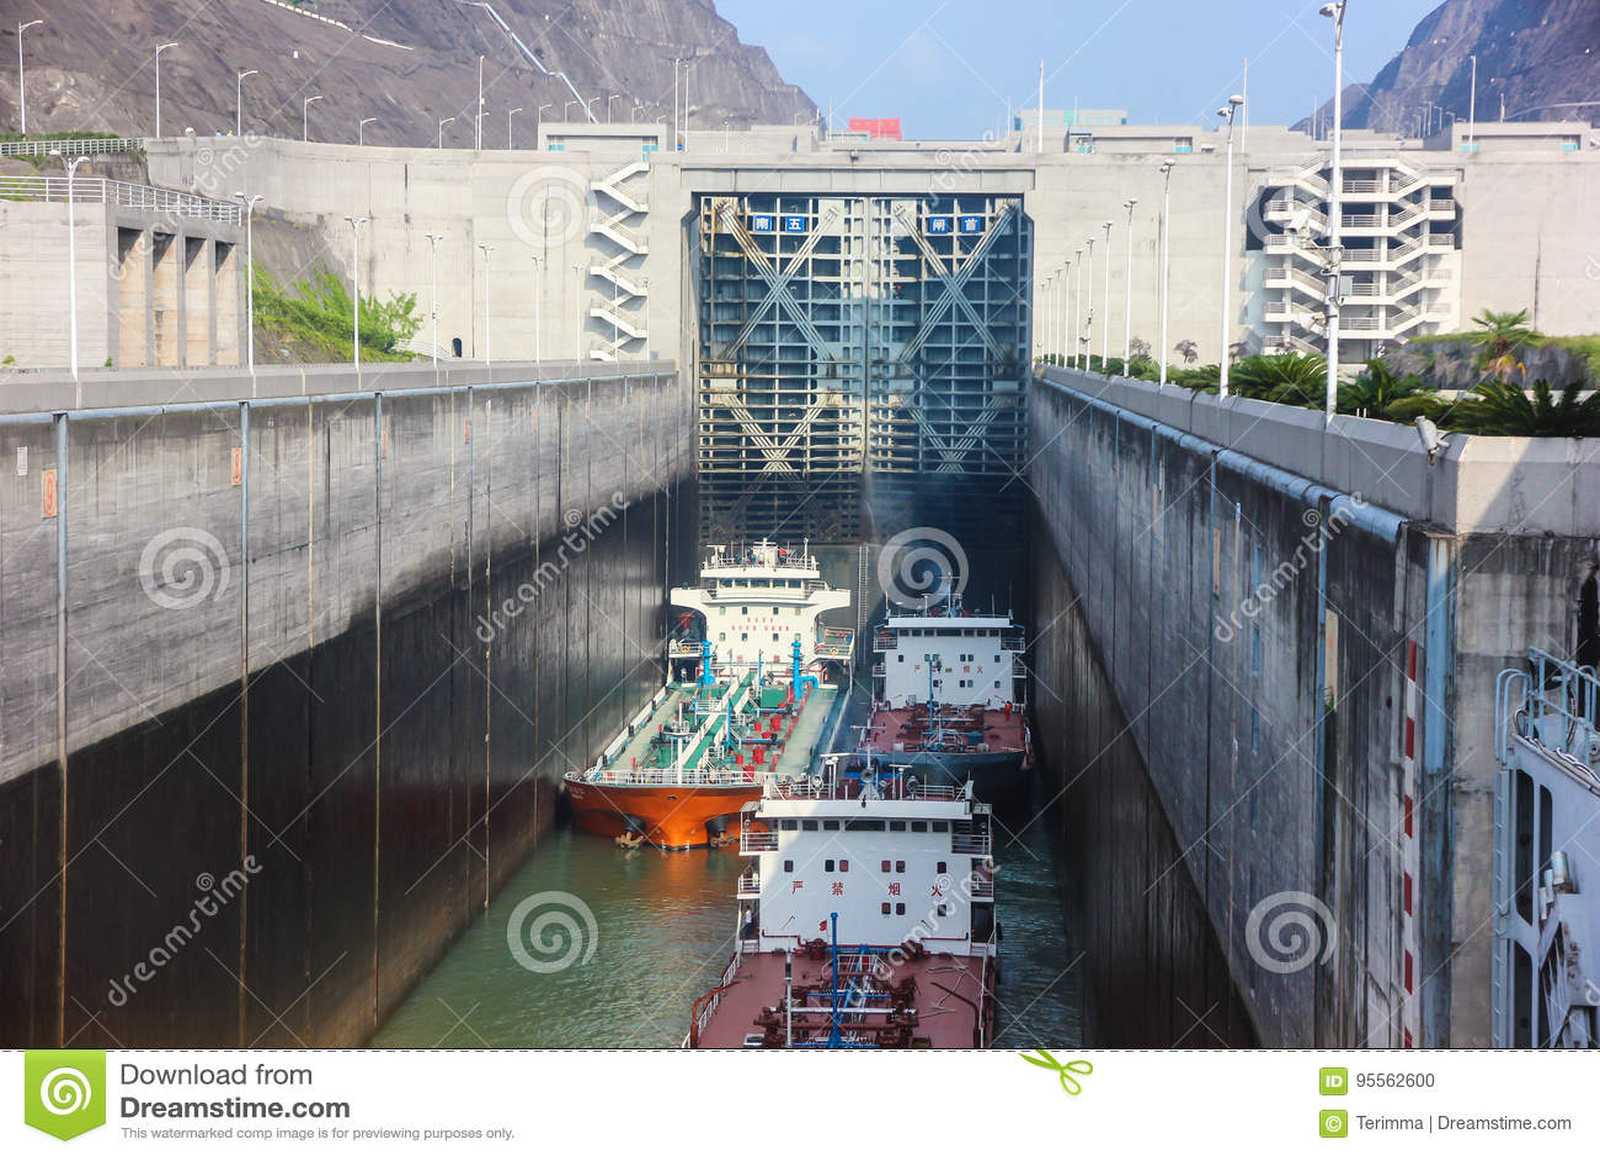 Zugang auf dem Jangtse, Three Gorge Dam, China